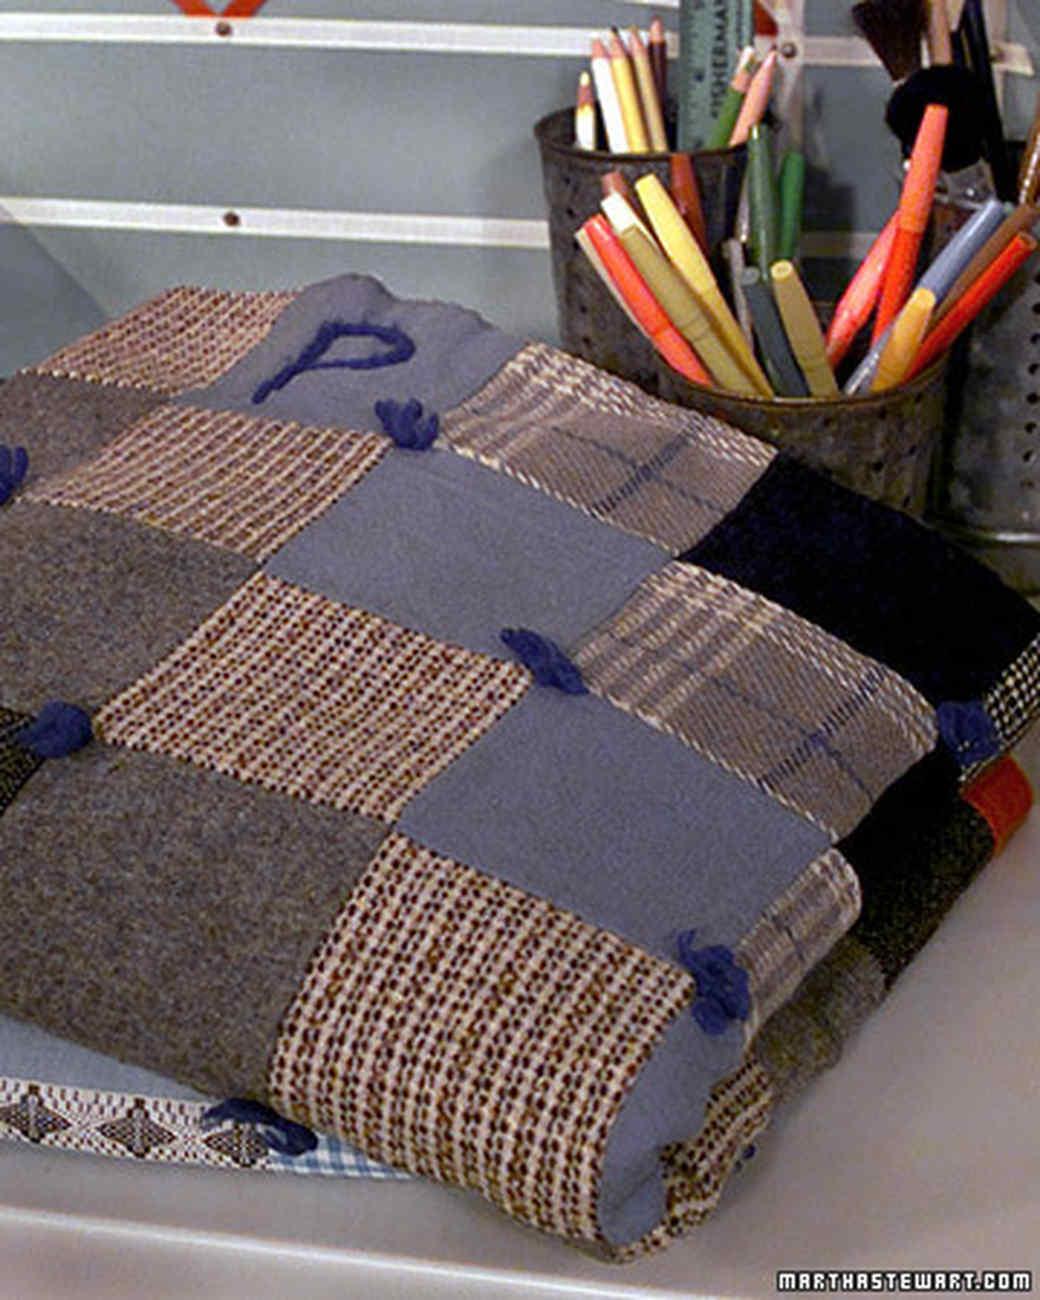 Wool-Tweed Patchwork Throw | Martha Stewart : how quilts are made - Adamdwight.com